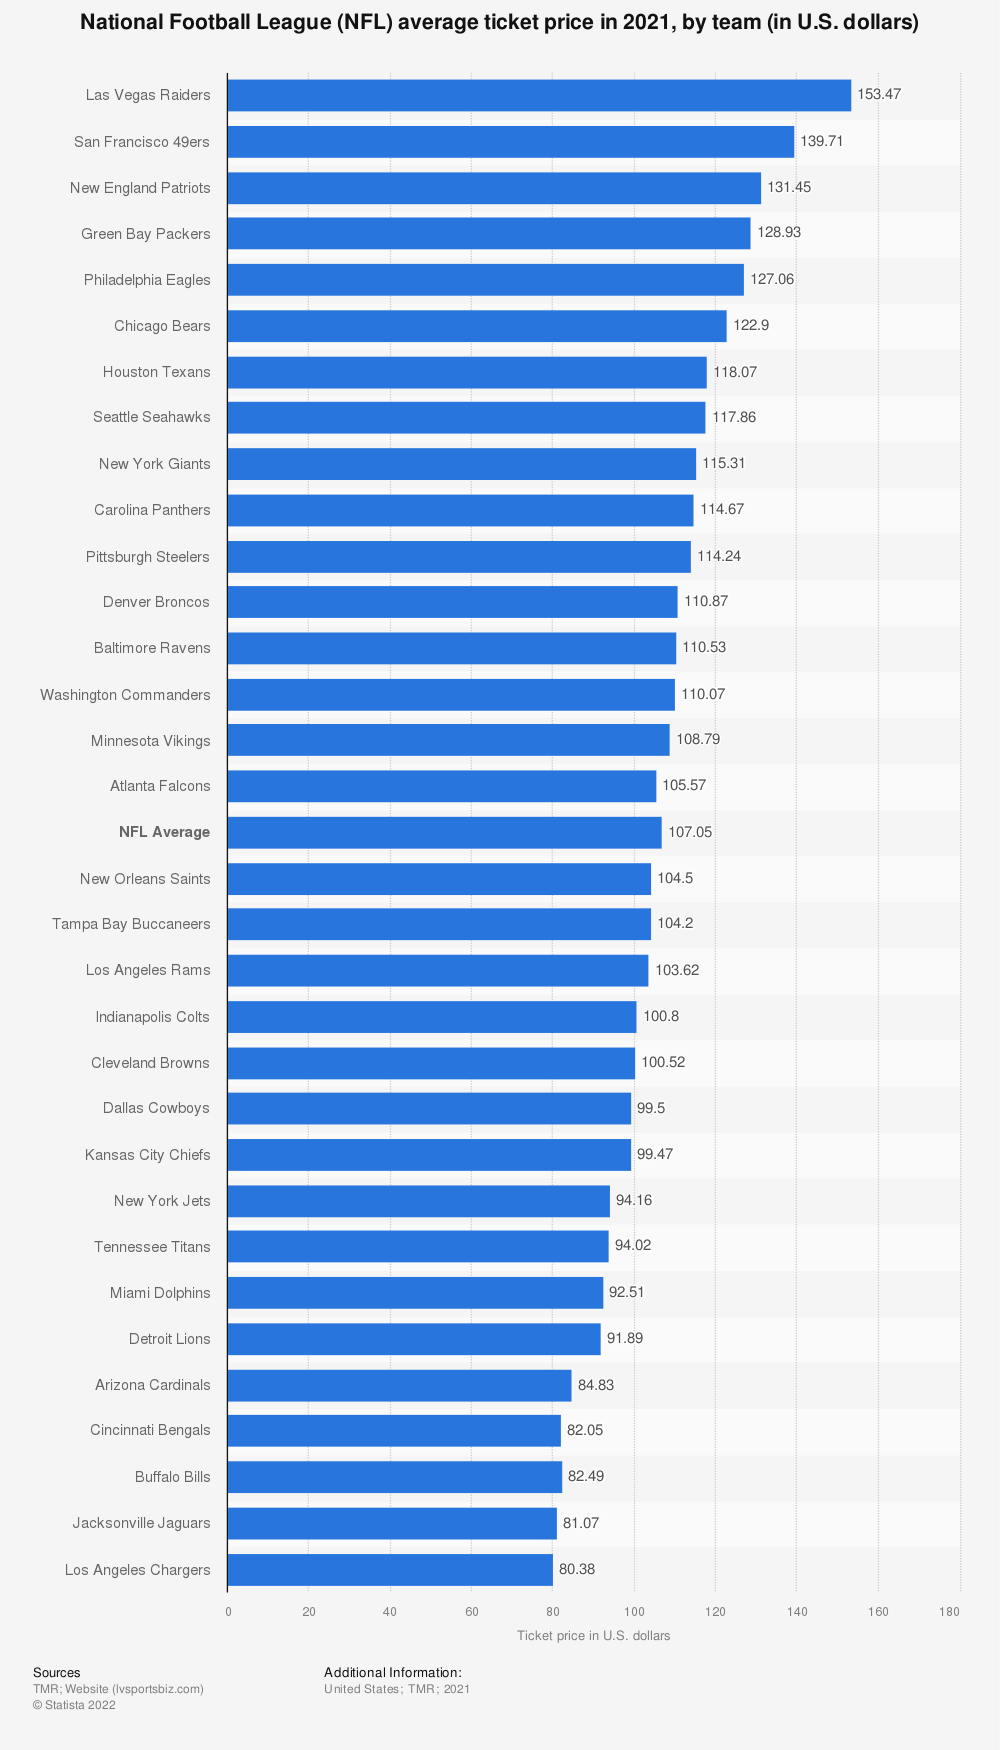 Statistic: National Football League (NFL) average ticket price by team in 2019 (in U.S. dollars)* | Statista